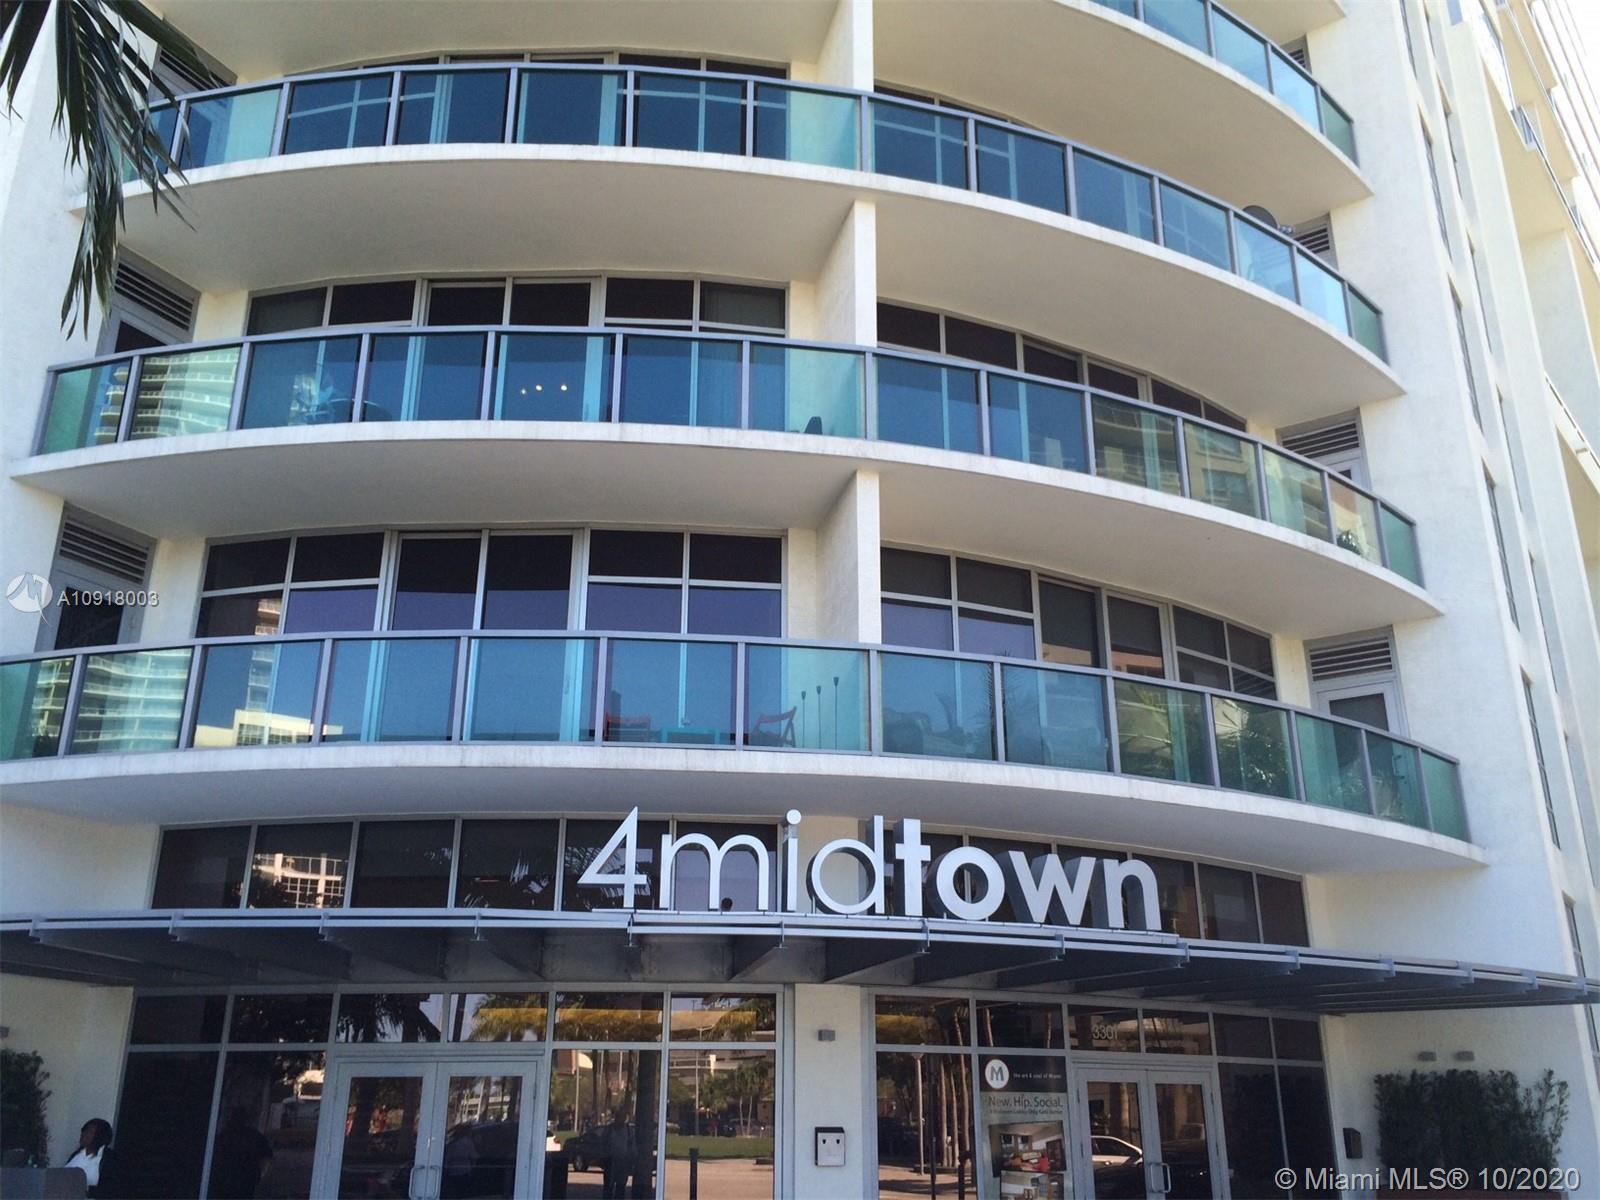 4 Midtown #H1608 photo13